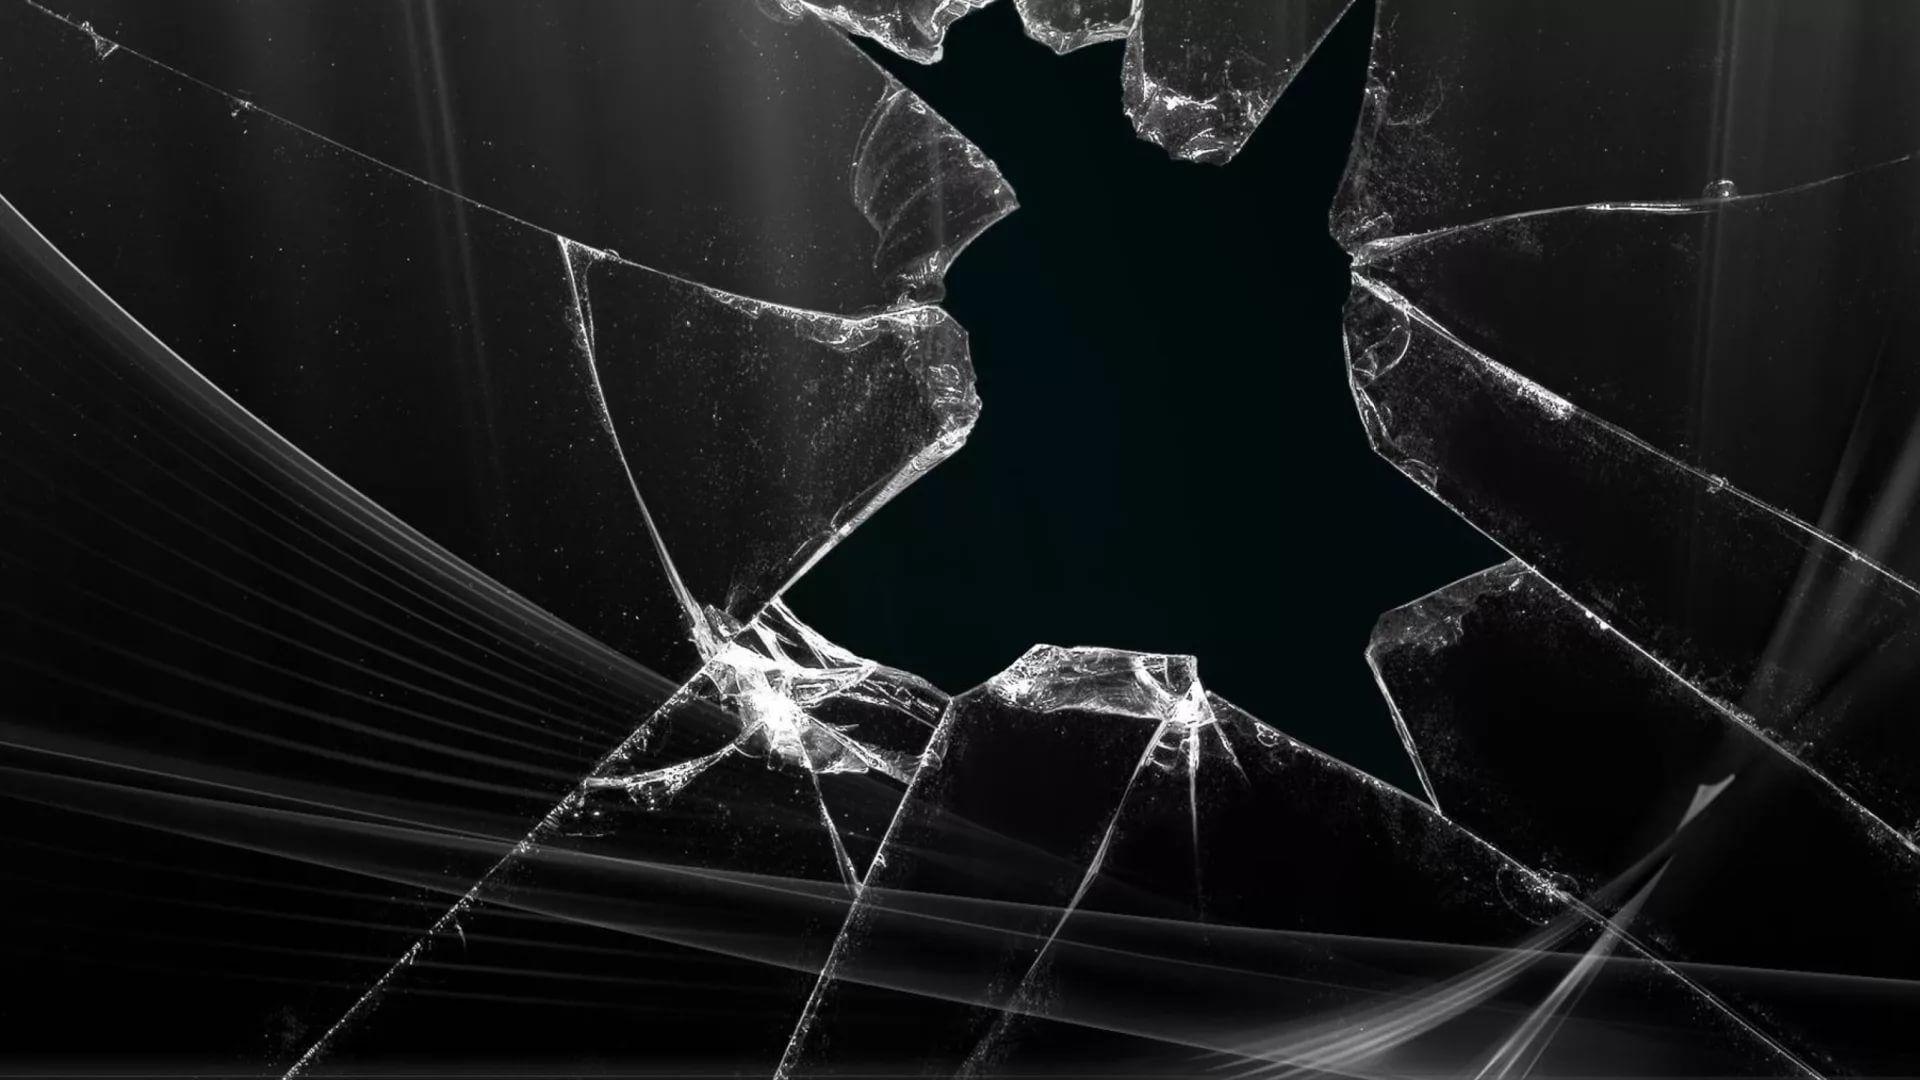 Broken Screen wallpaper photo full hd